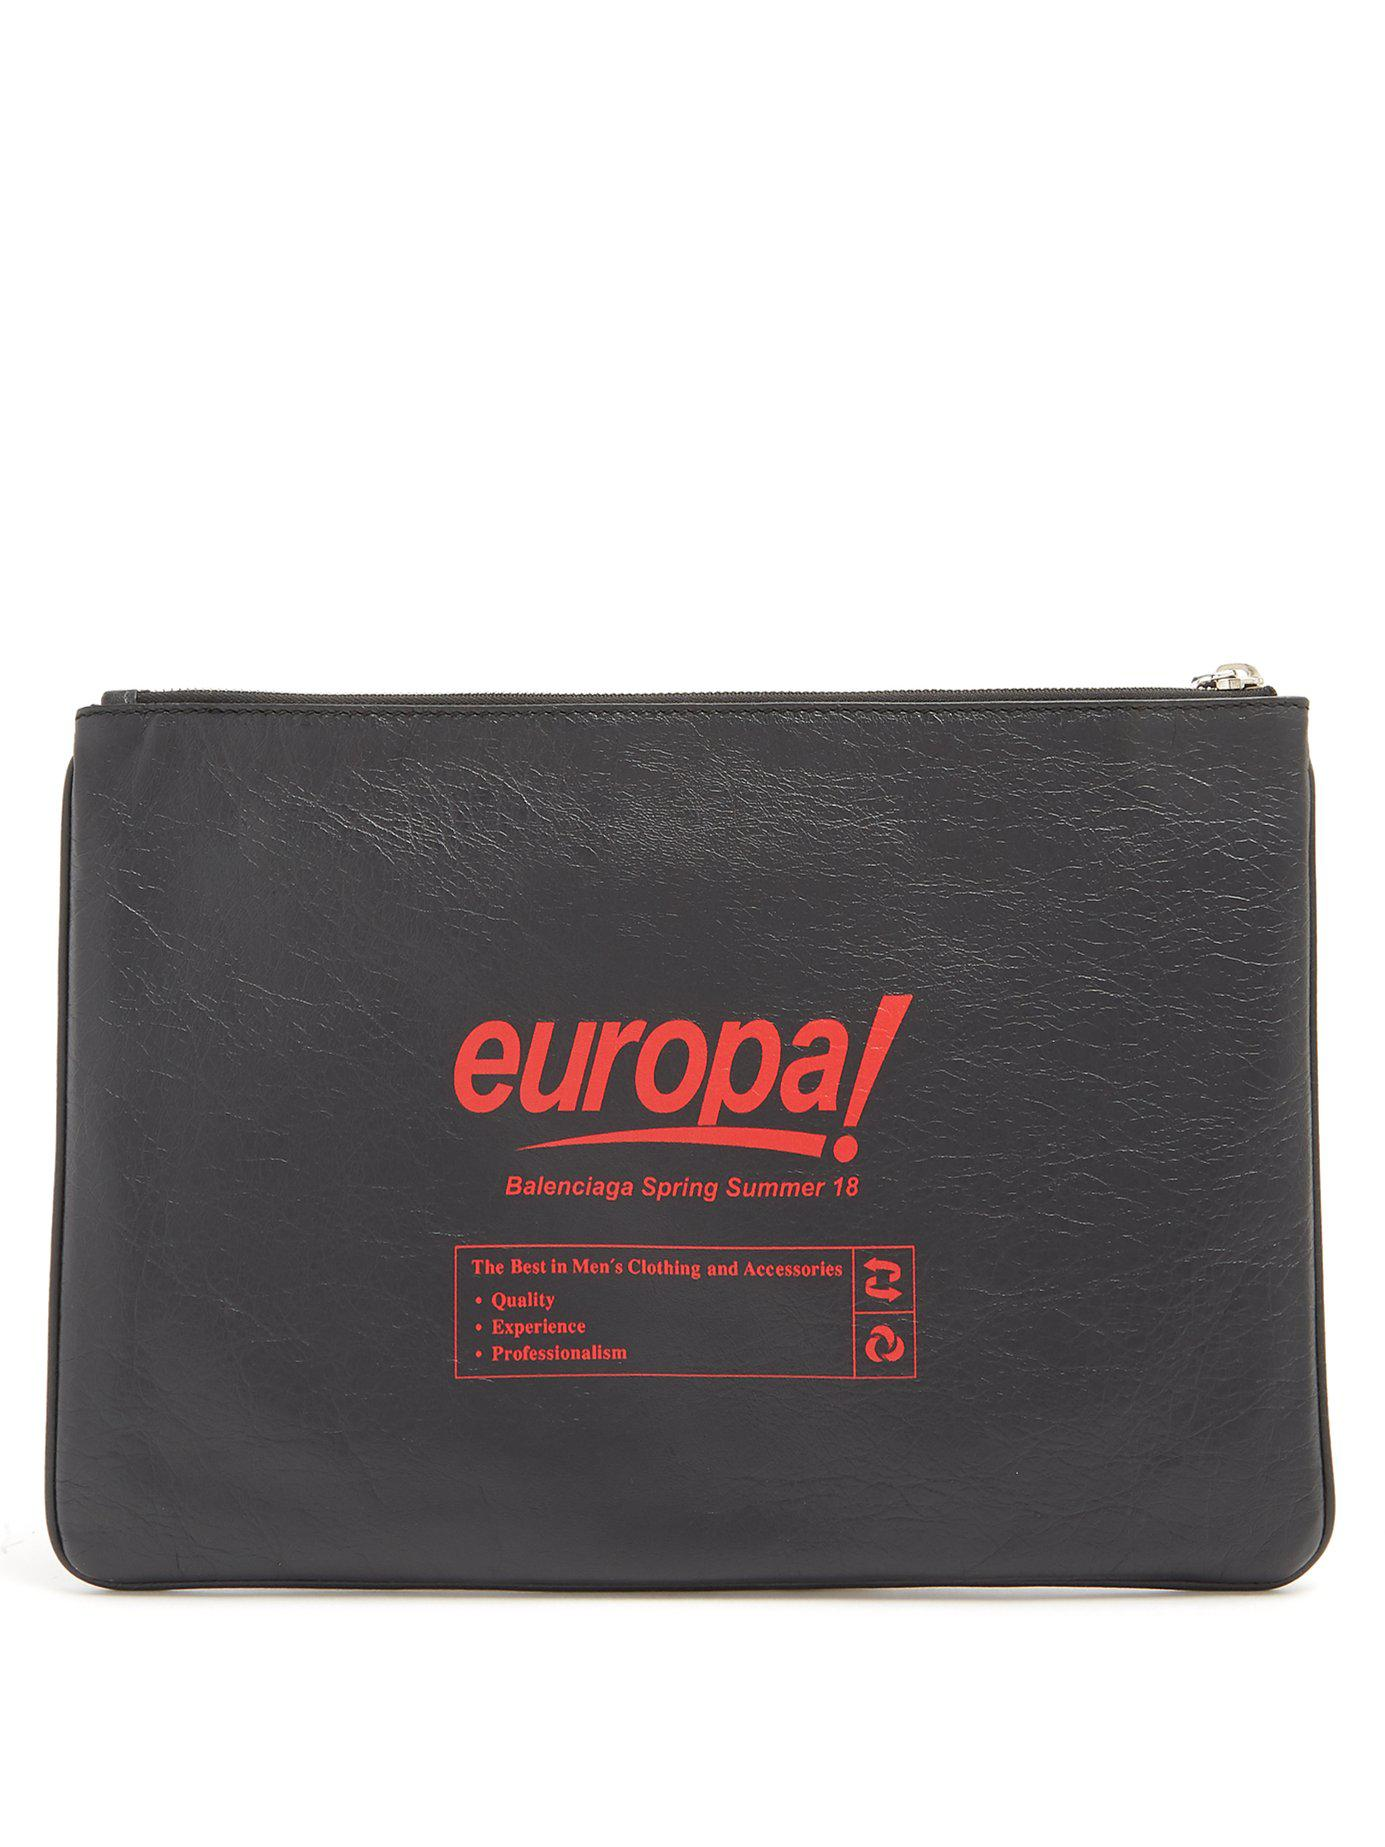 Balenciaga Pochette en cuir à imprimé Europa Yw9KjxBDrG